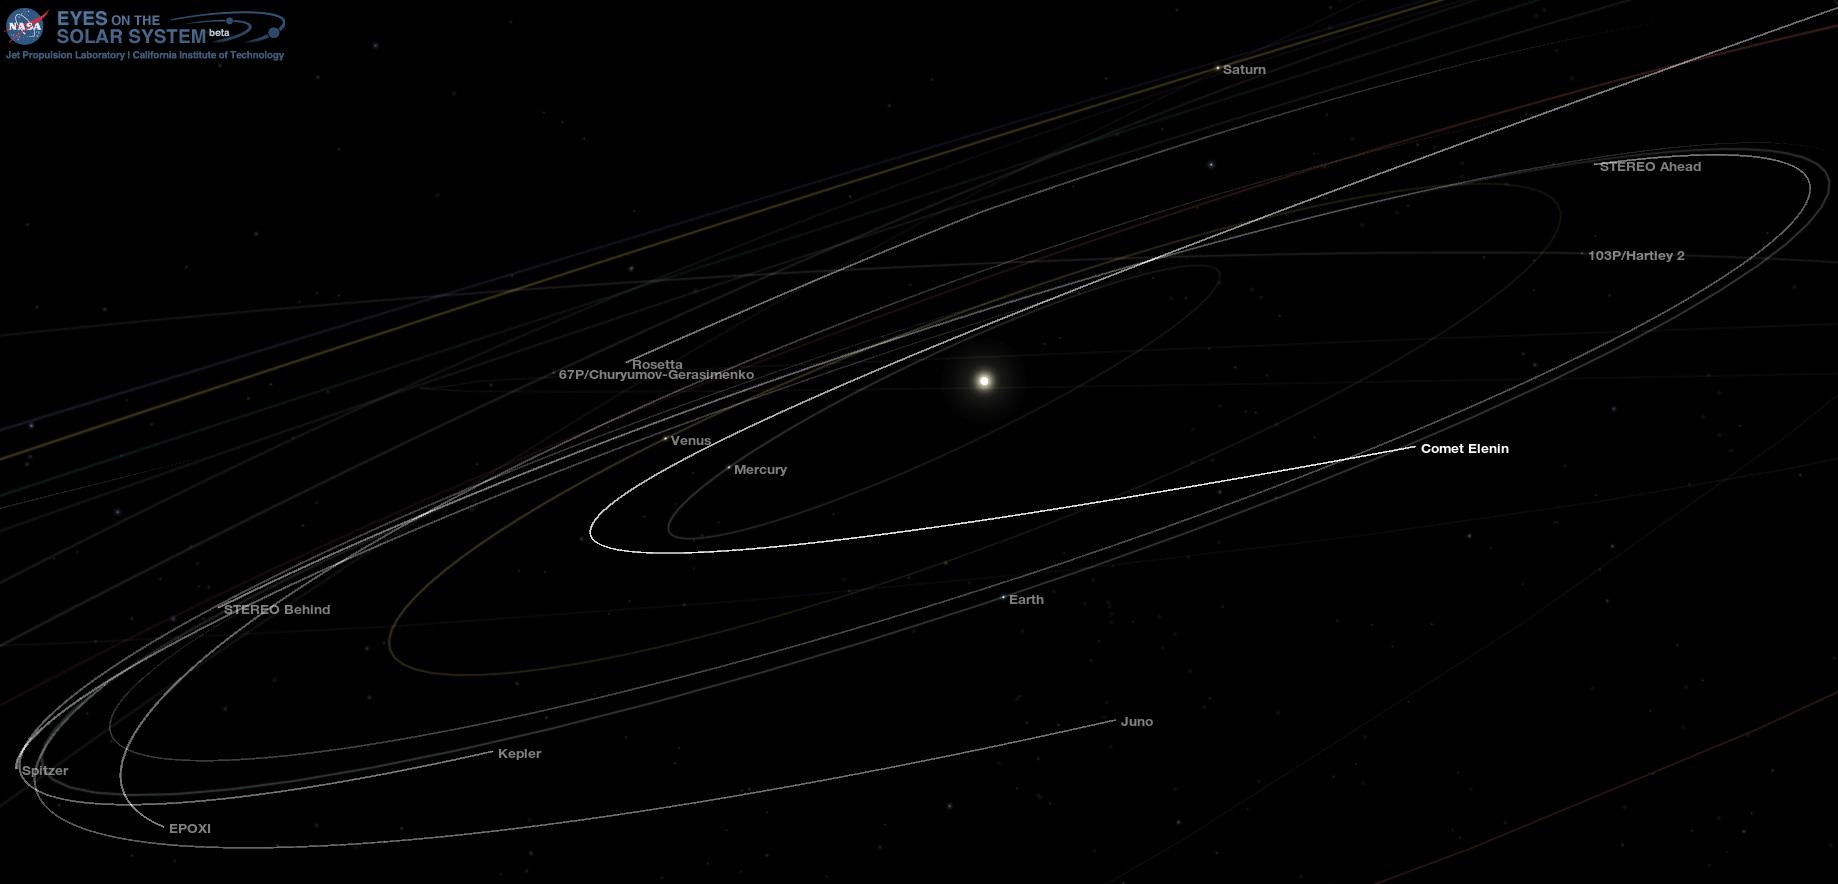 NASA - NASA Says Comet Elenin Gone and Should Be Forgotten